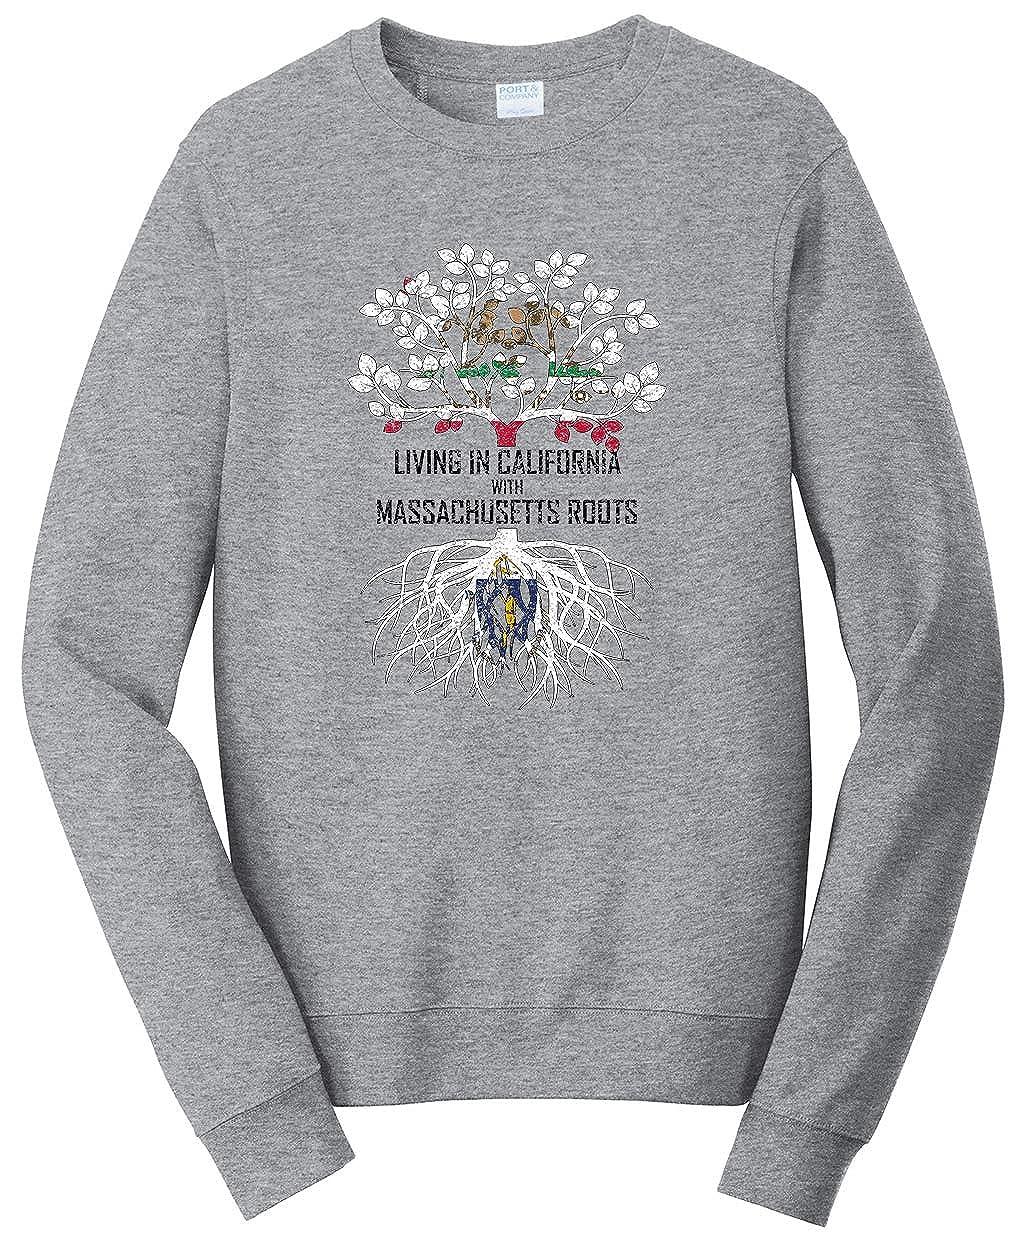 Tenacitee Girls Living in Massachusetts with Alaska Roots Hooded Sweatshirt